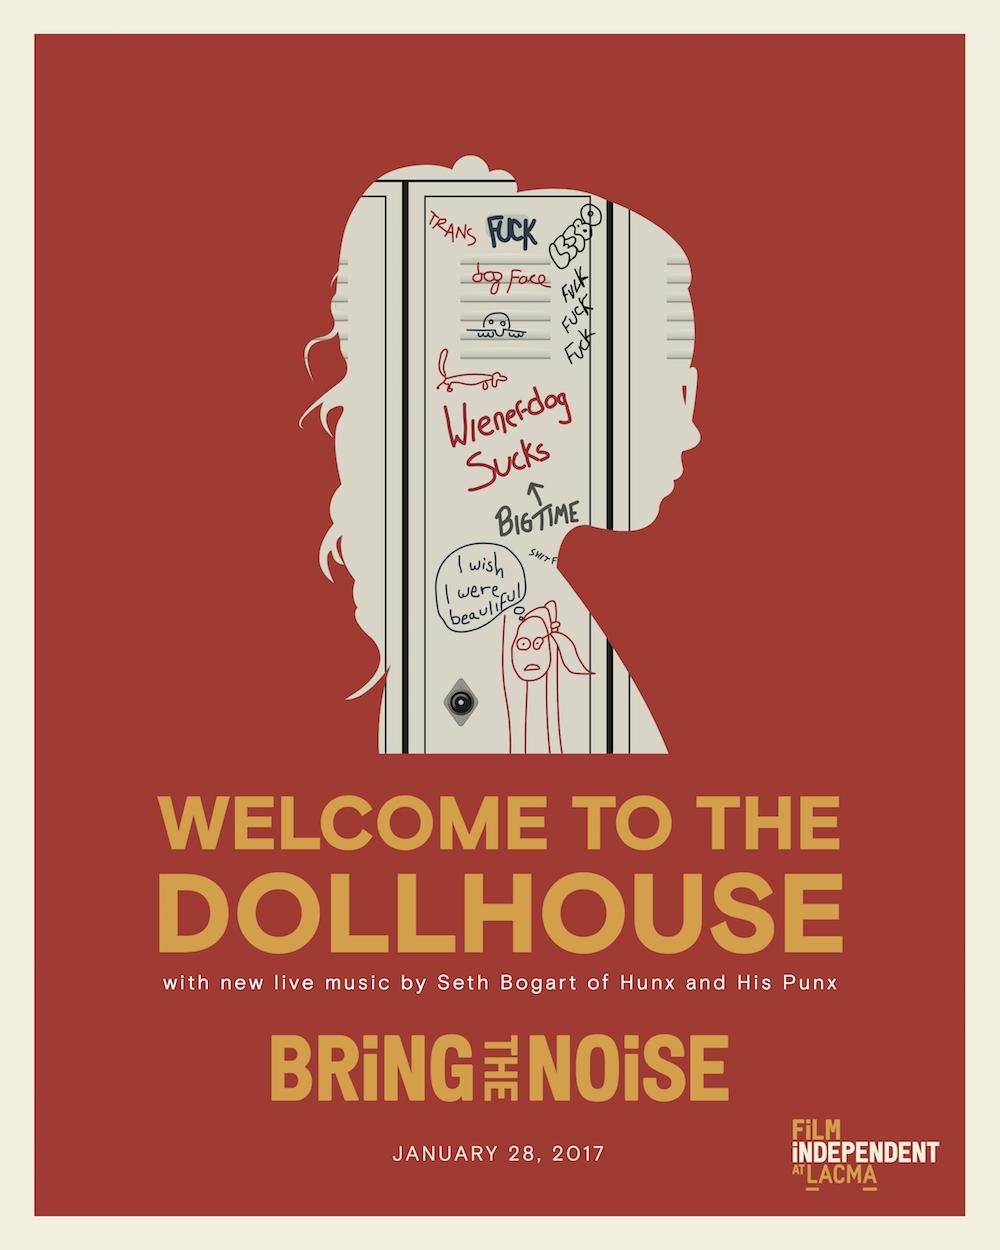 Bring-The-Noise-Welcome-to-the-Dollhouse-POSTER5b15d5b45d5b15d5b15d5b15d5b15d.jpg